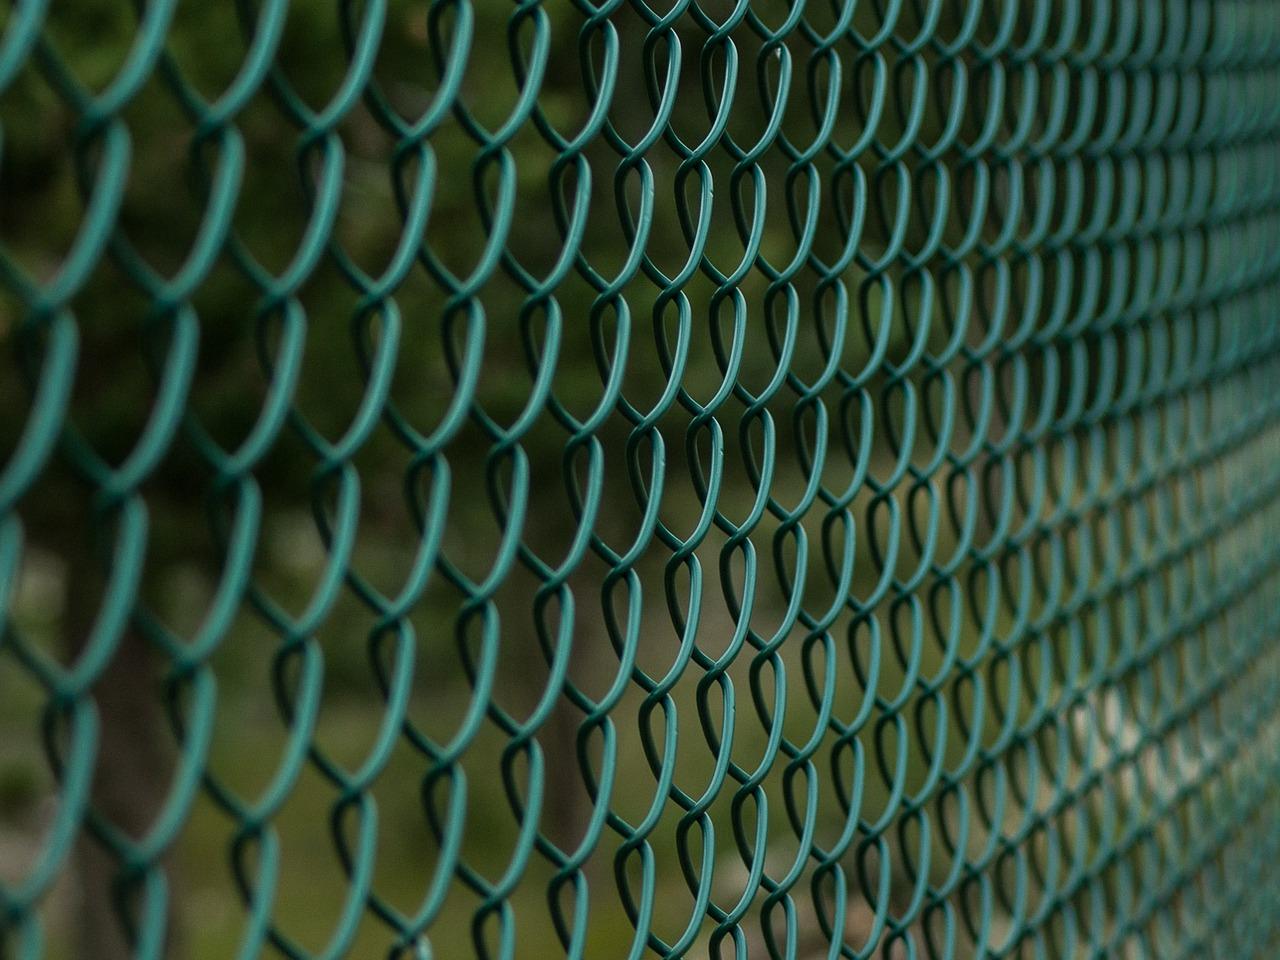 fence-1161128_1280